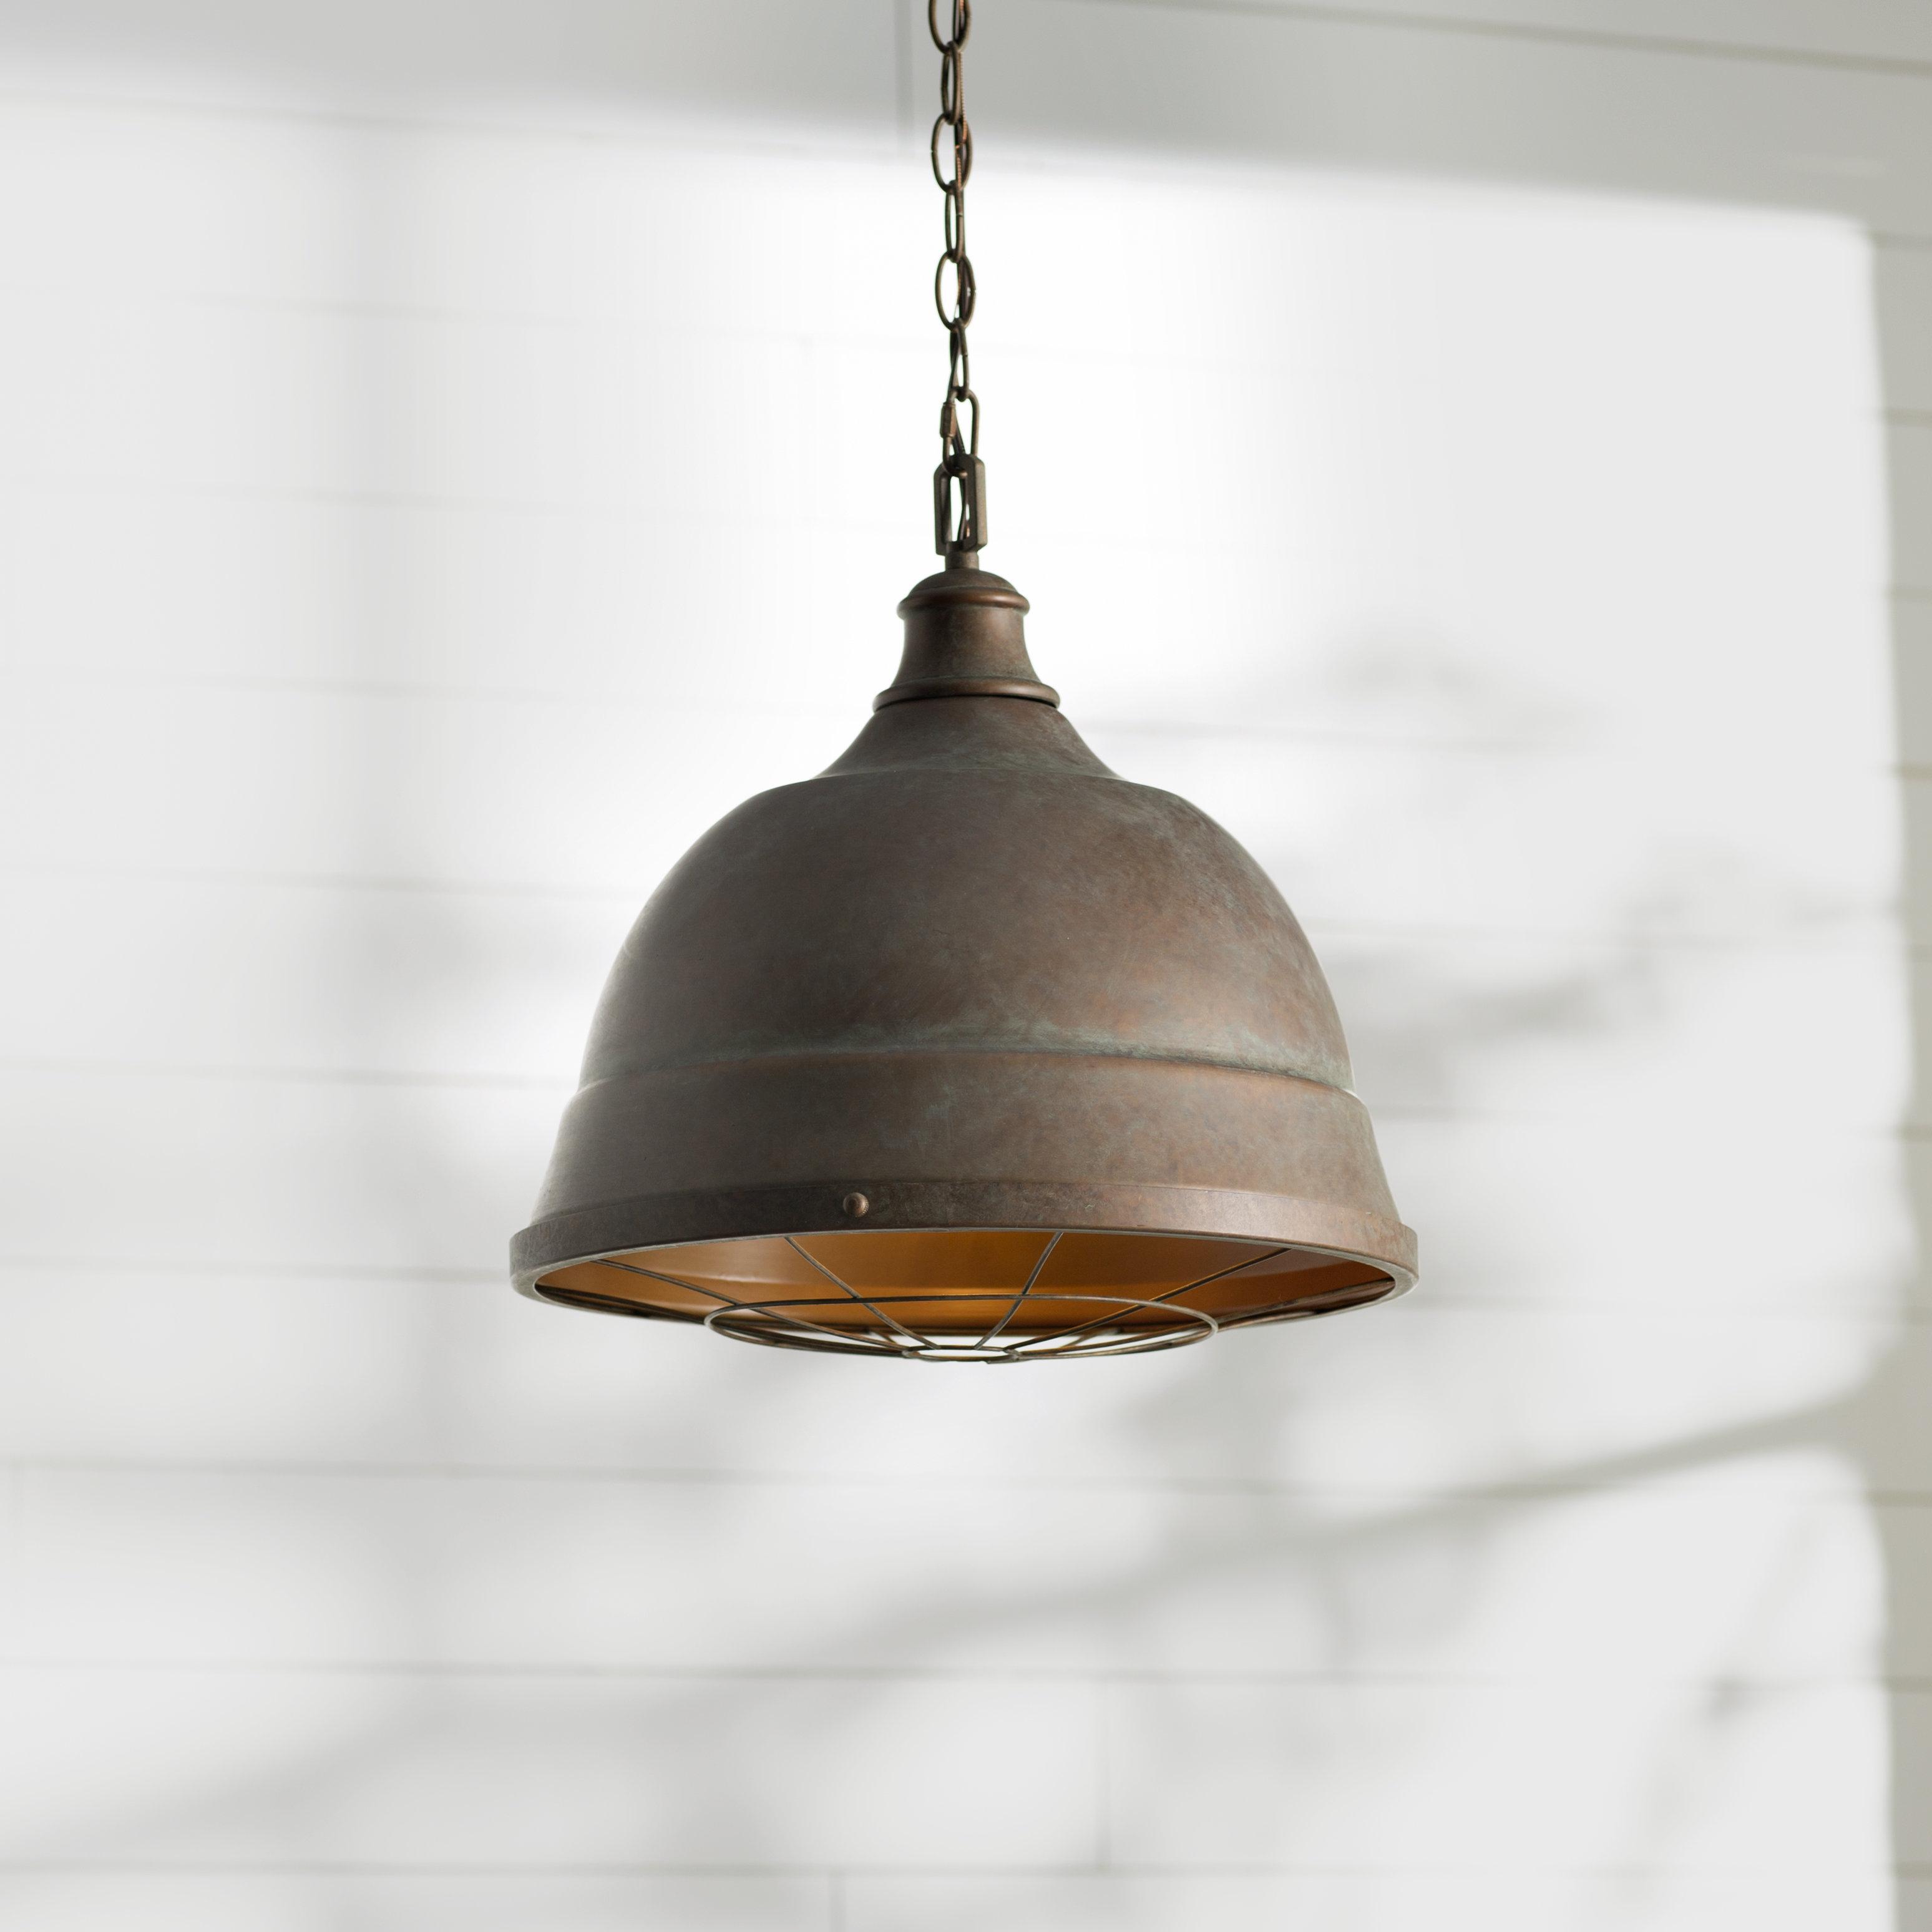 Farmhouse & Rustic 2 Light Pendants | Birch Lane in Amara 2-Light Dome Pendants (Image 15 of 30)